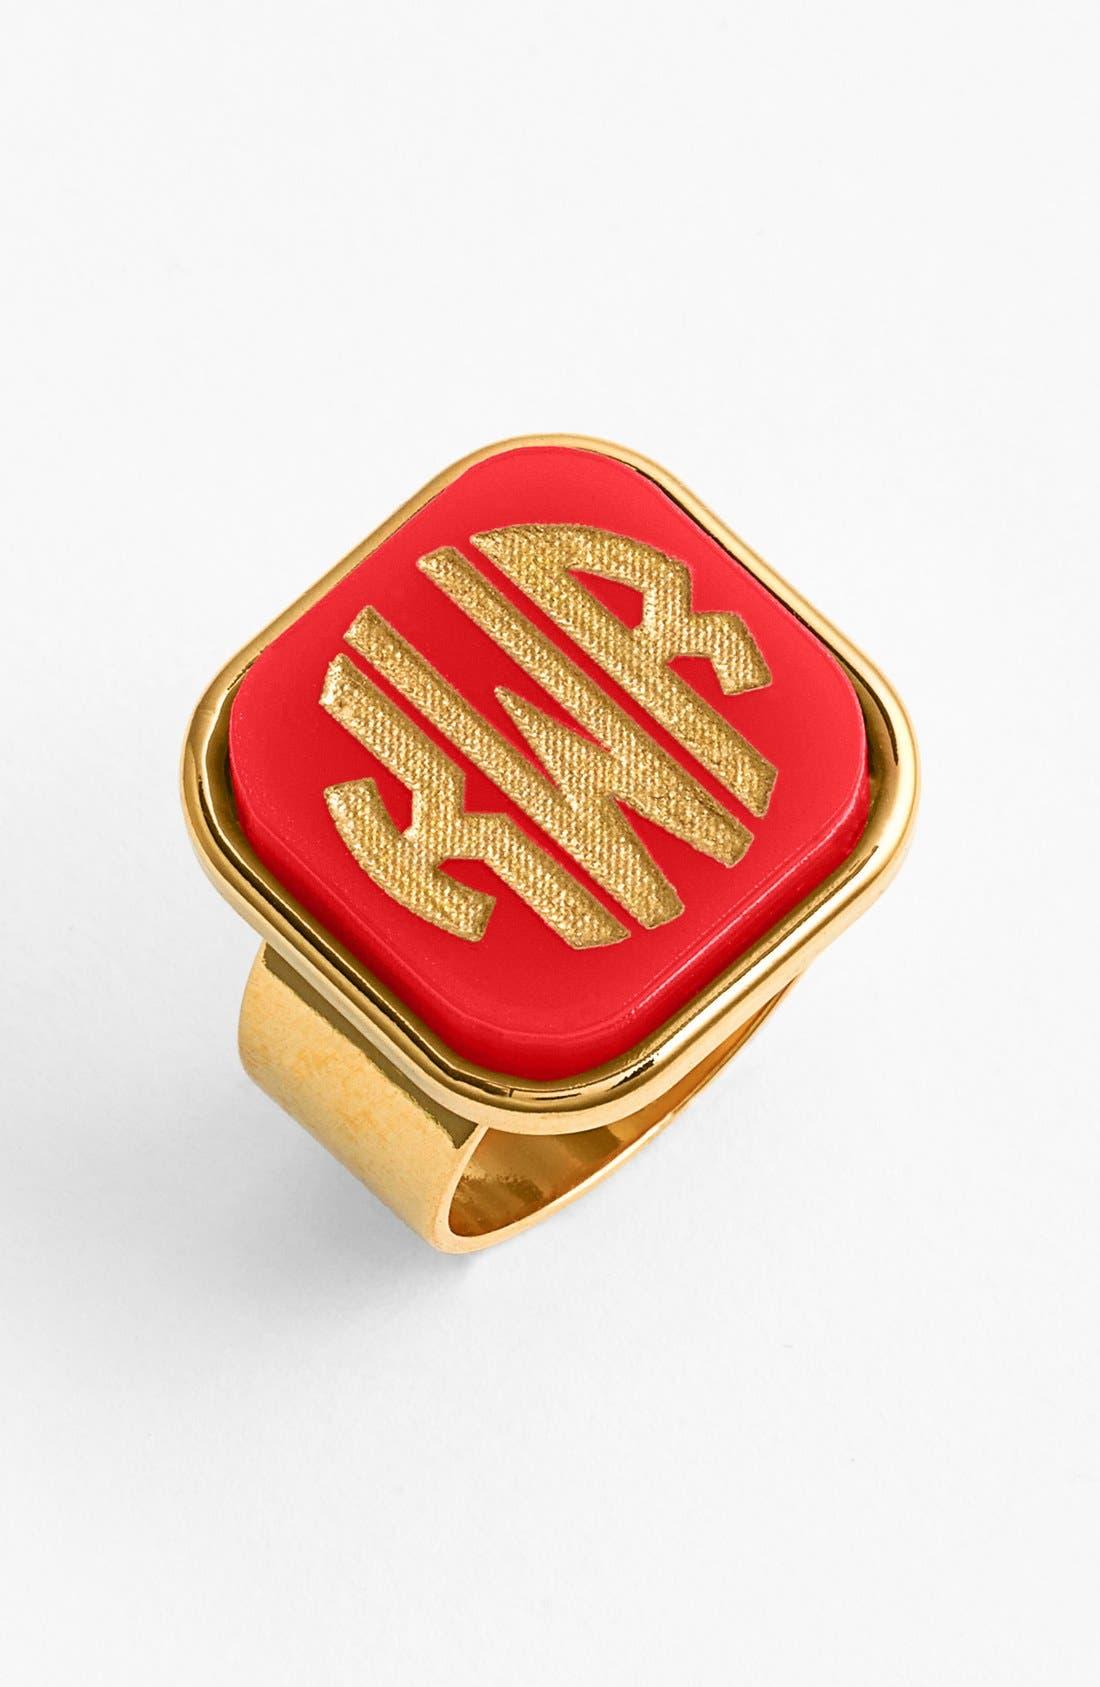 'Vineyard' Personalized Monogram Ring,                             Main thumbnail 1, color,                             Ruby